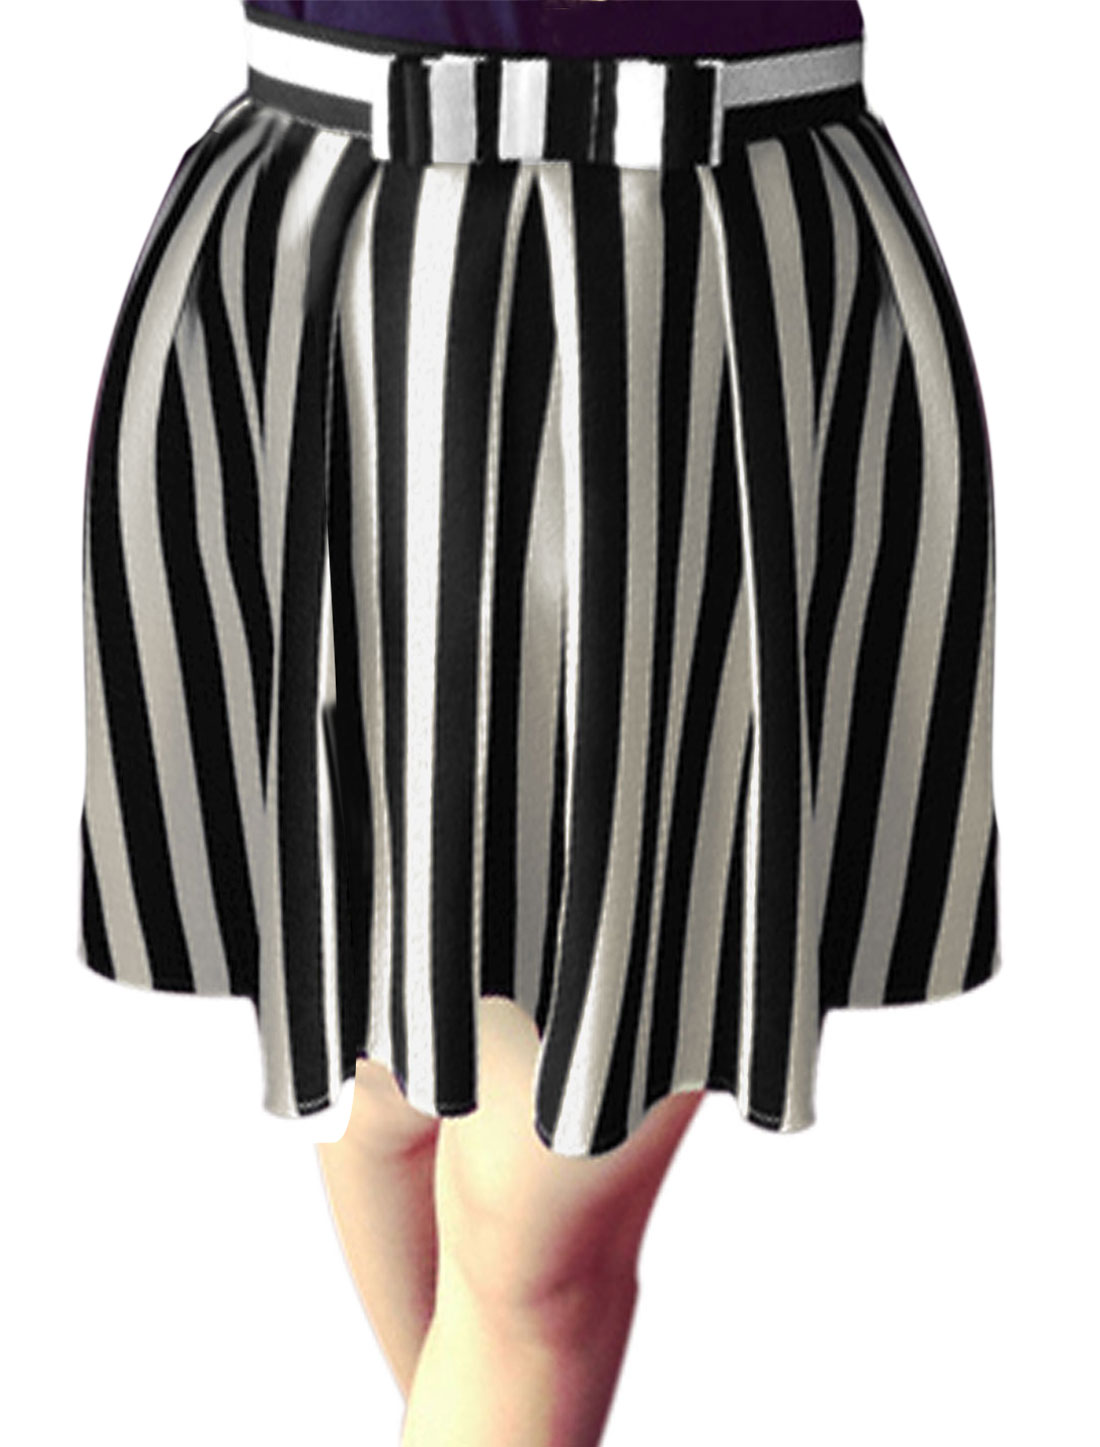 Ladies Stripes Pattern Hidden Zipper Lining Chiffon A-Line Skirt Black White XS